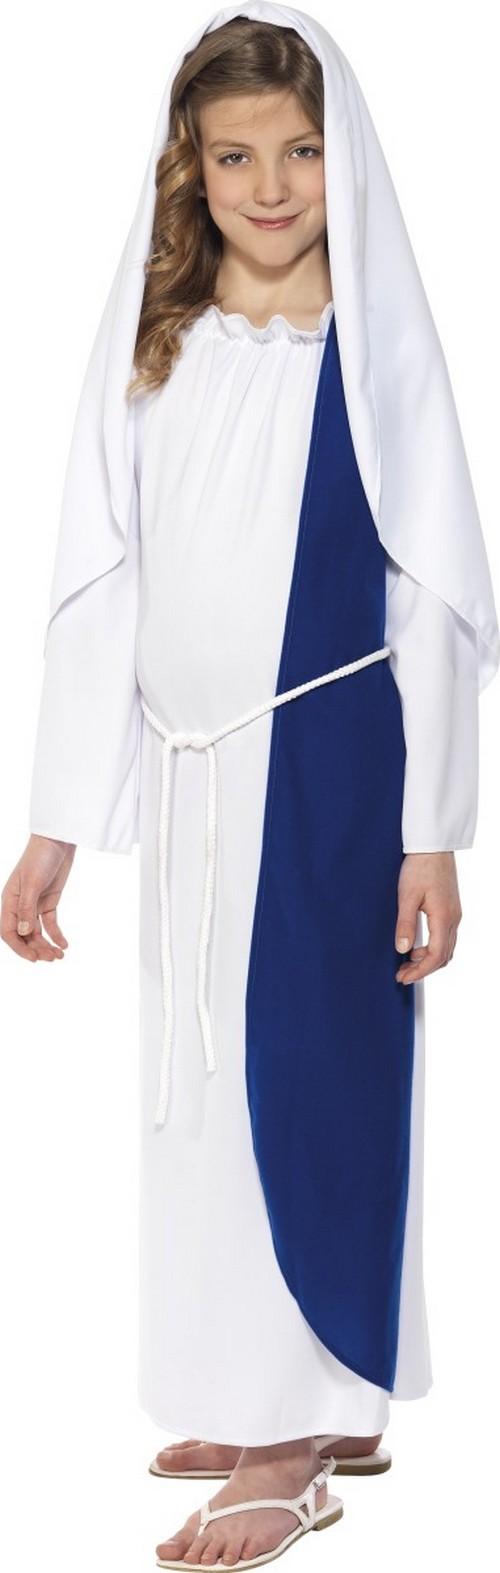 97c8dfac13db24 Kostuums · Verkleedkostuum Heilige Maagd Maria Kerst voor meisjes